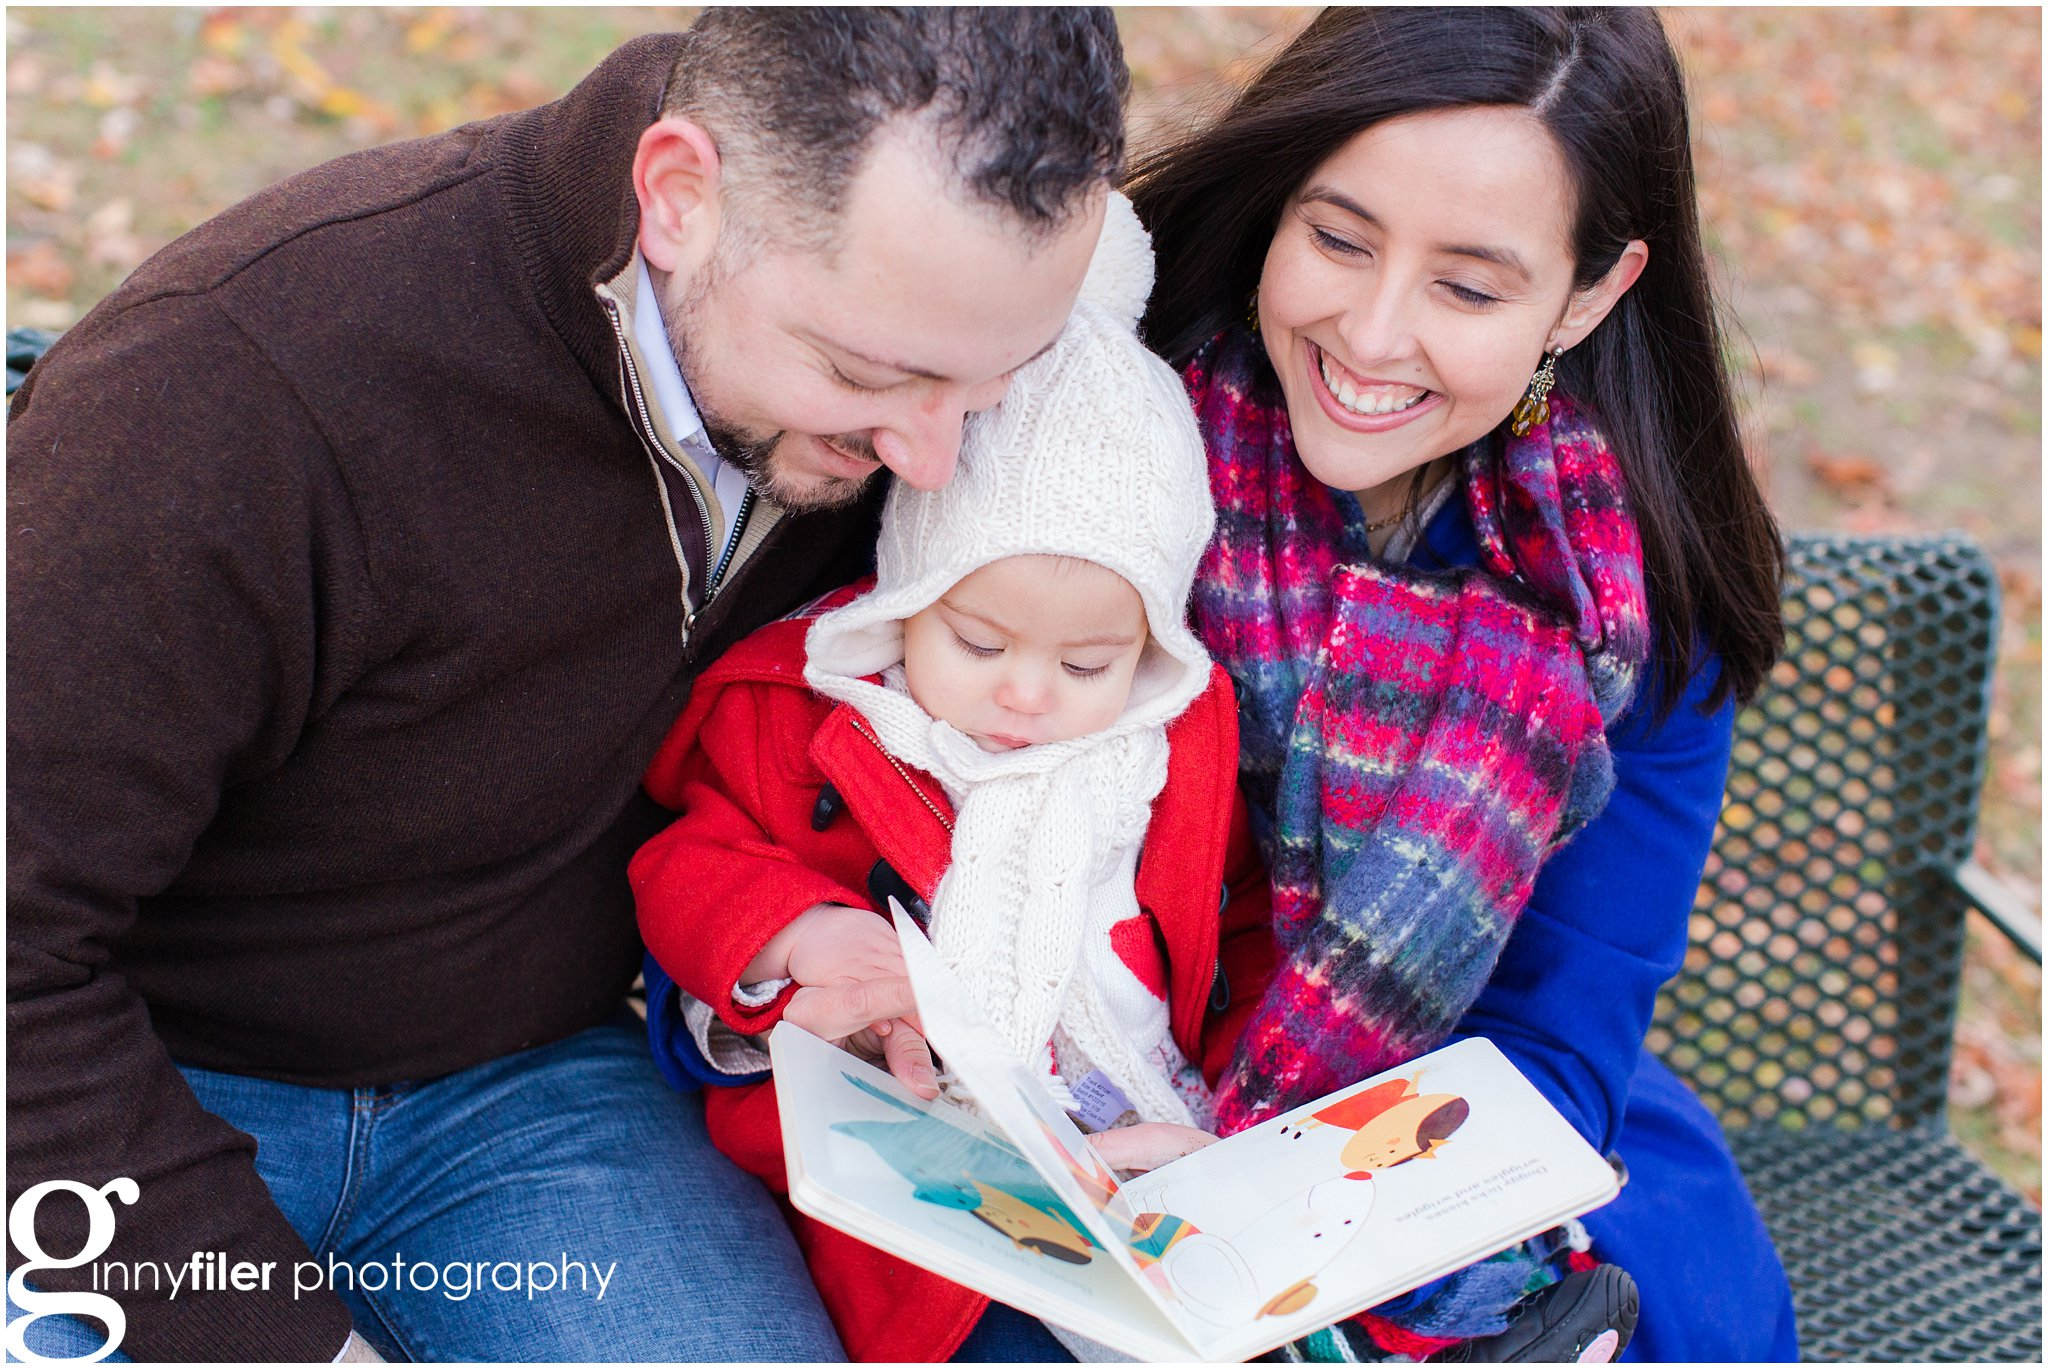 family_photography_Sanchez_0015.jpg